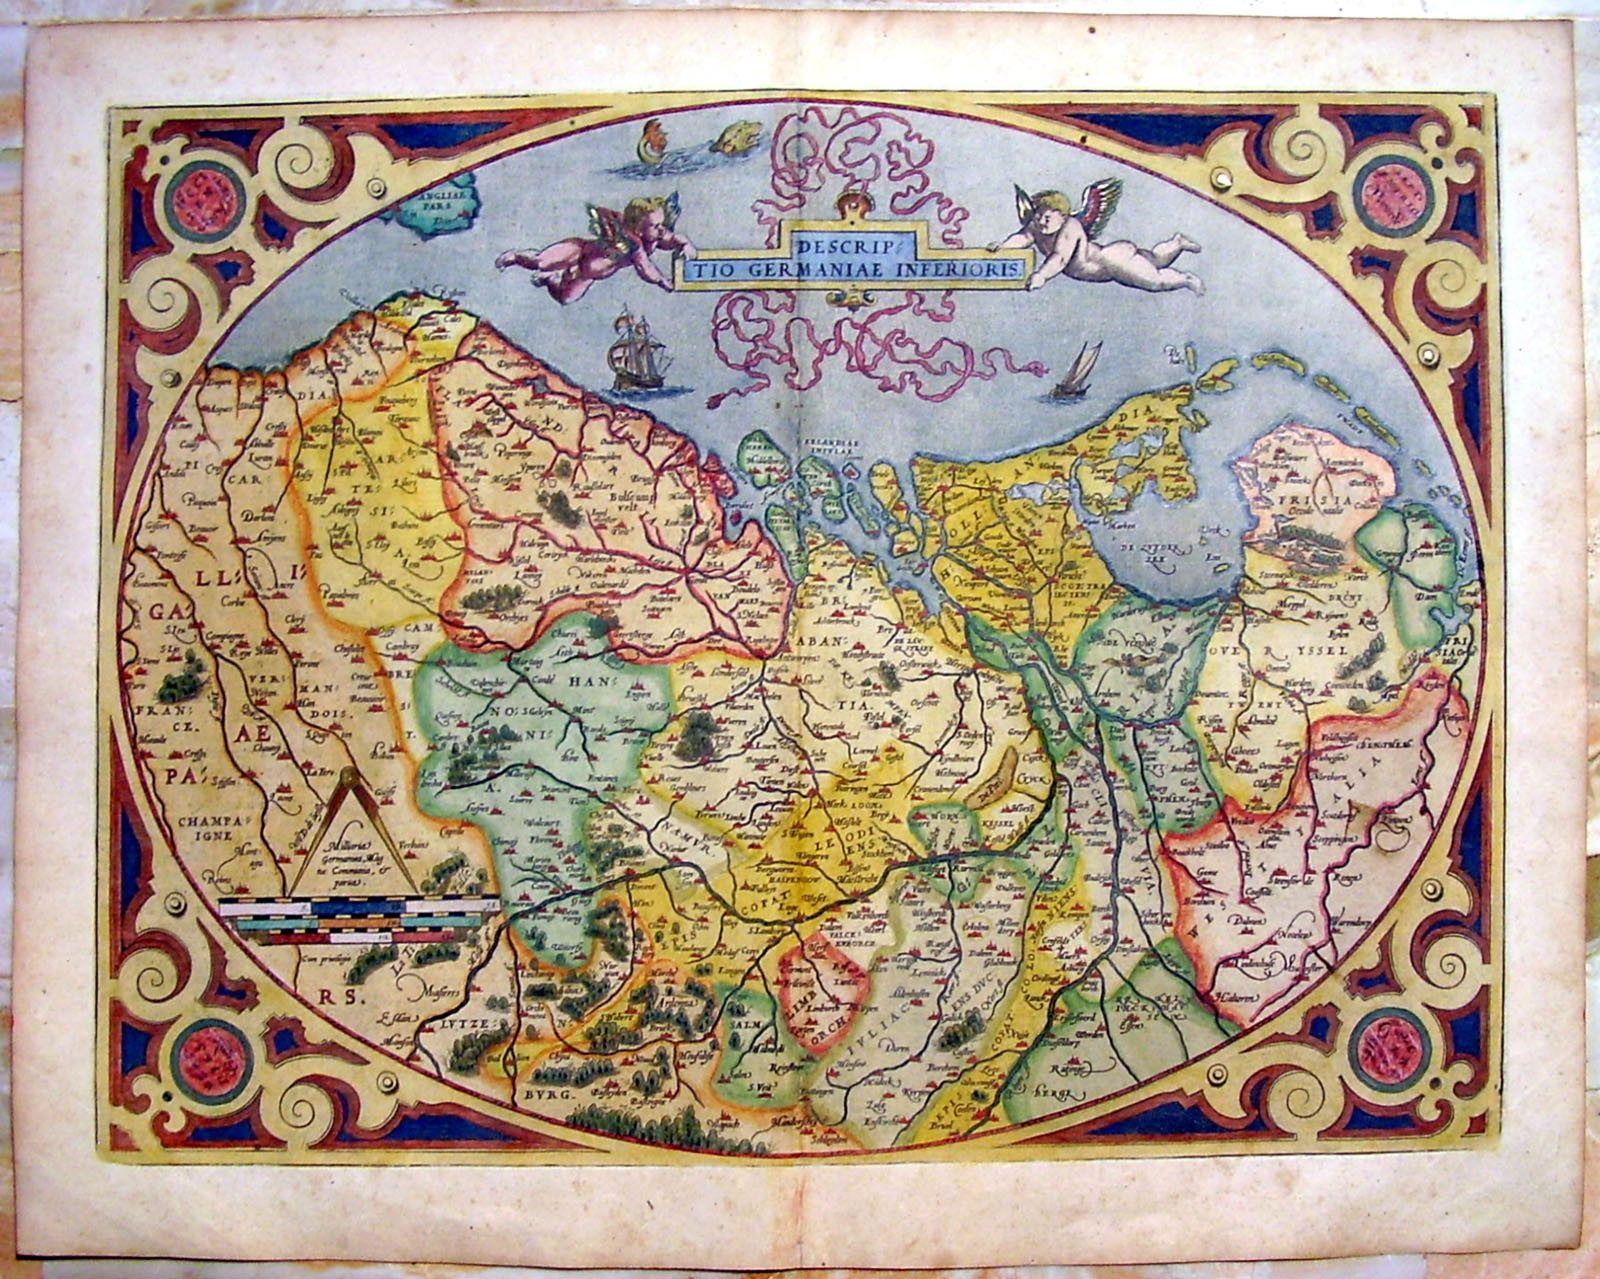 abraham ortelius 1587 original antique map the netherlands holland belgium europe geography mapping cartography illustration